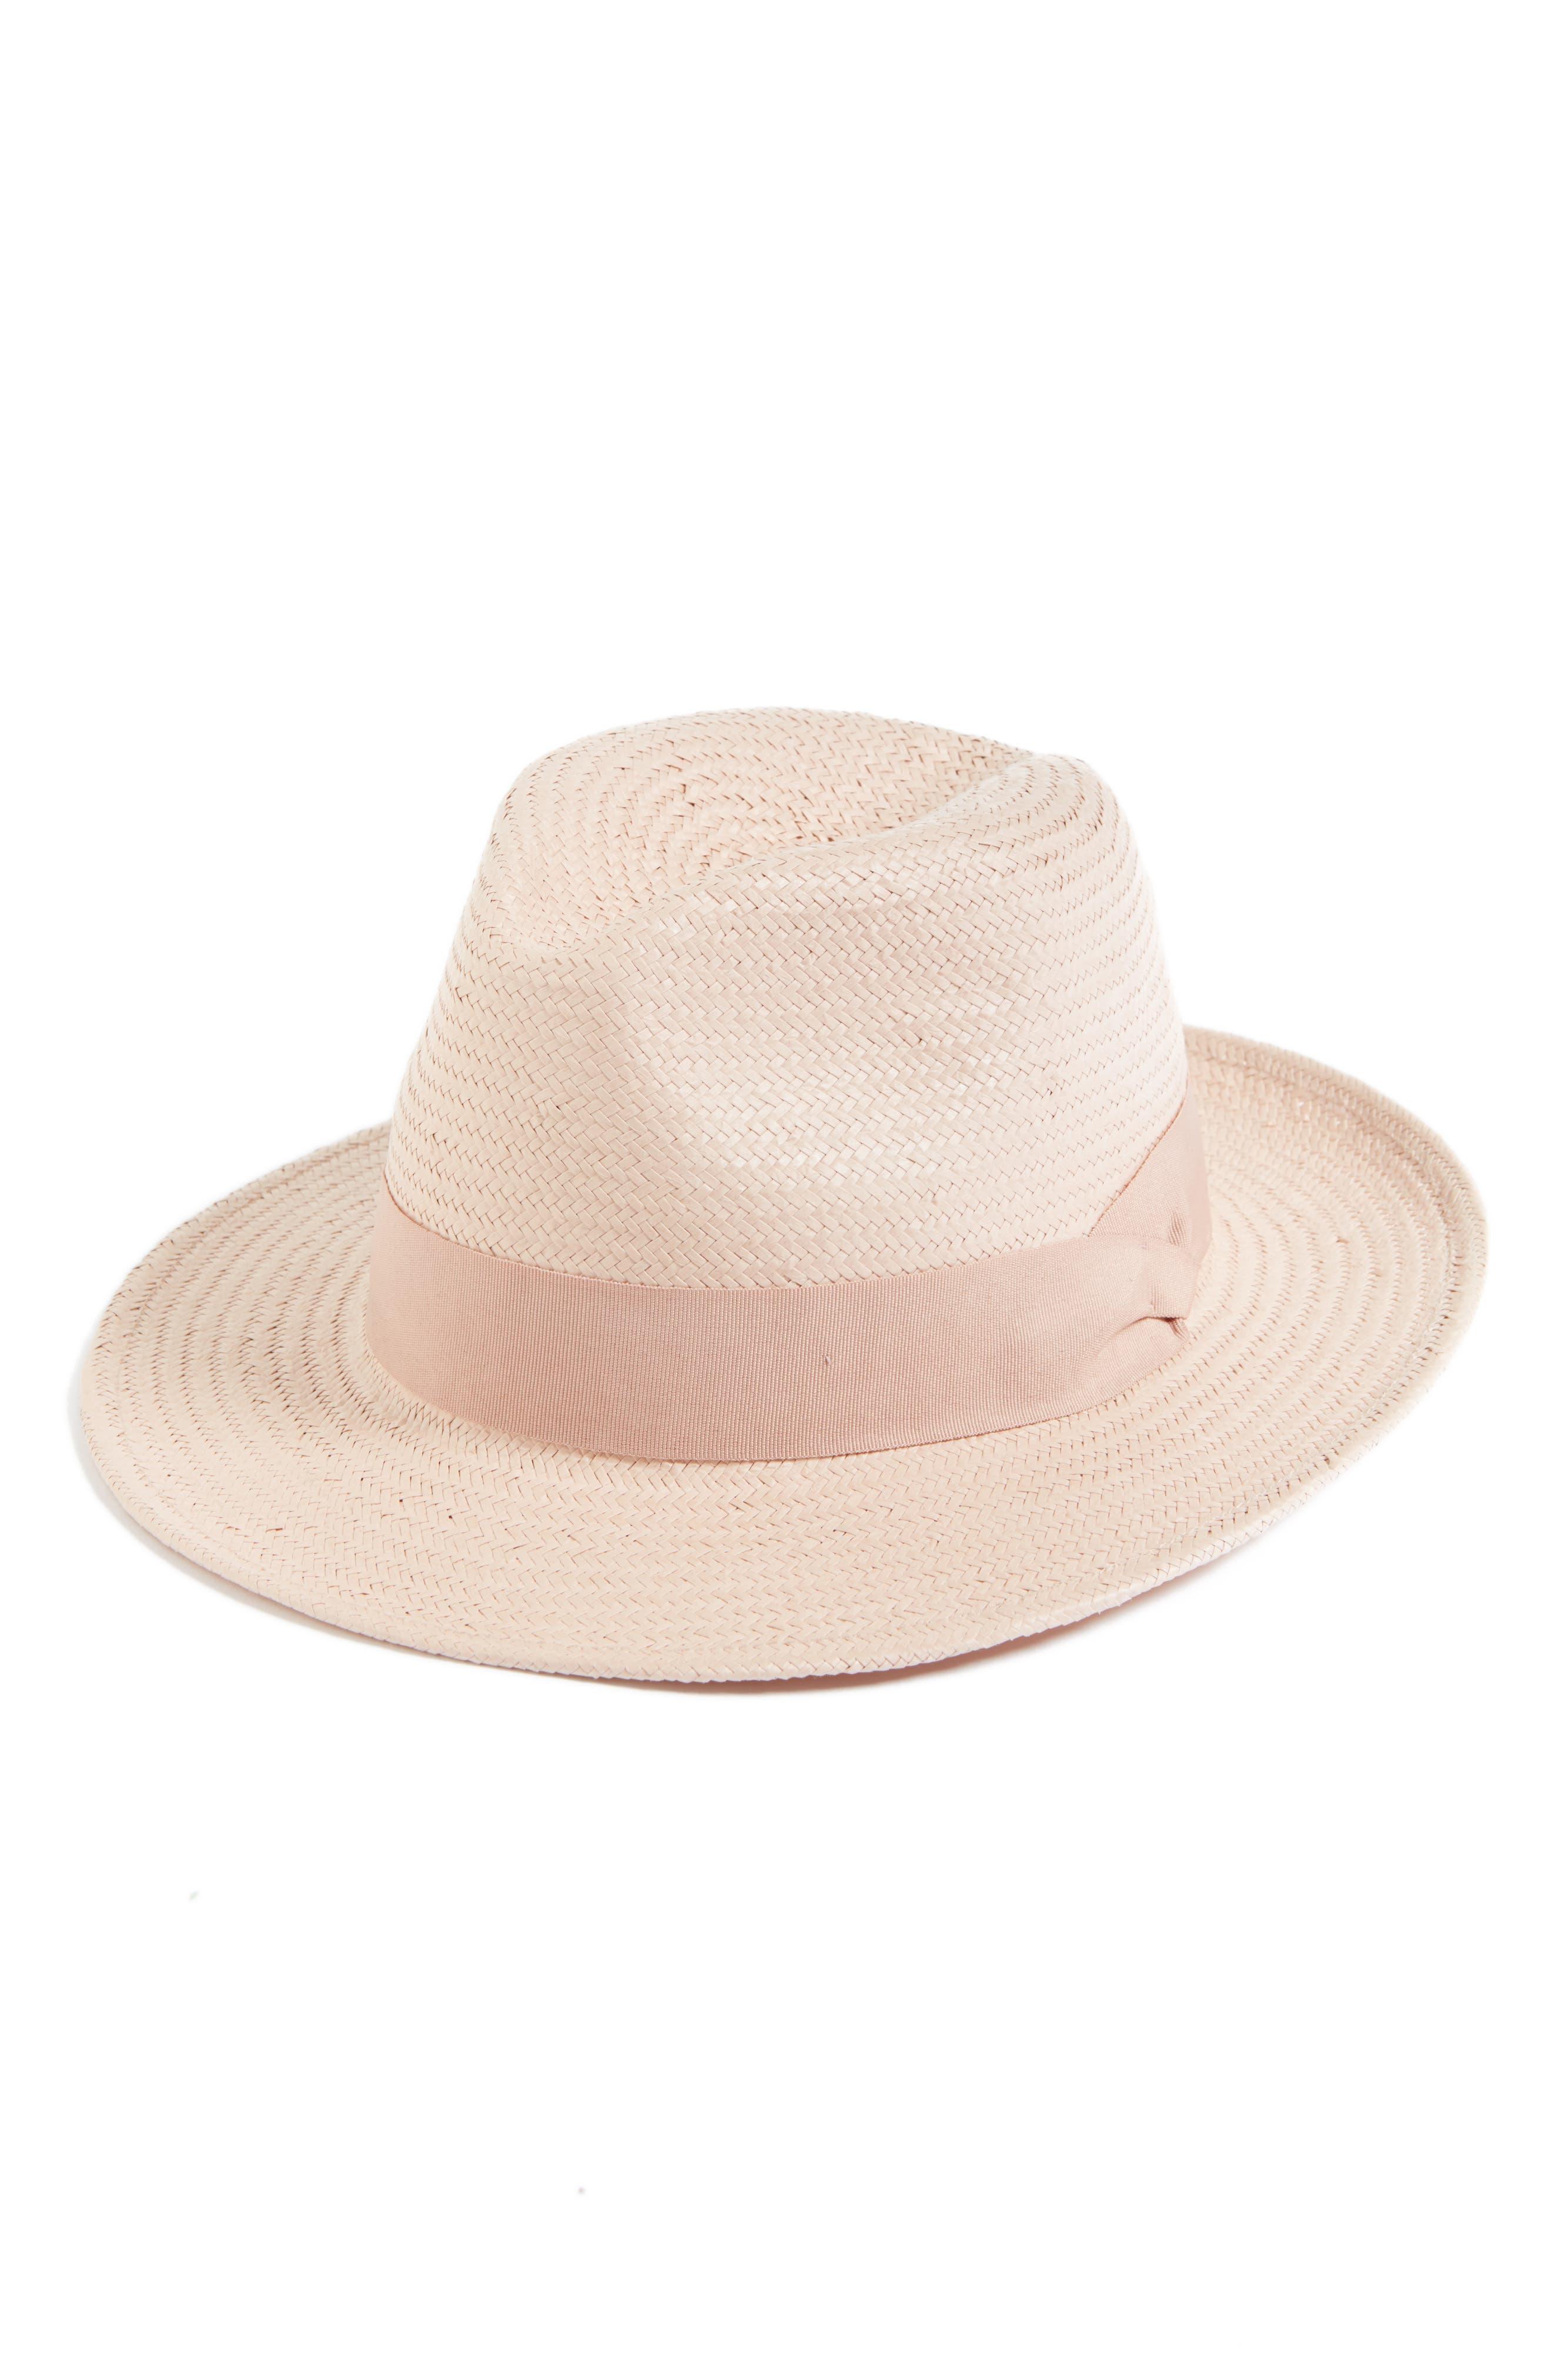 Straw Panama Hat,                         Main,                         color, 680